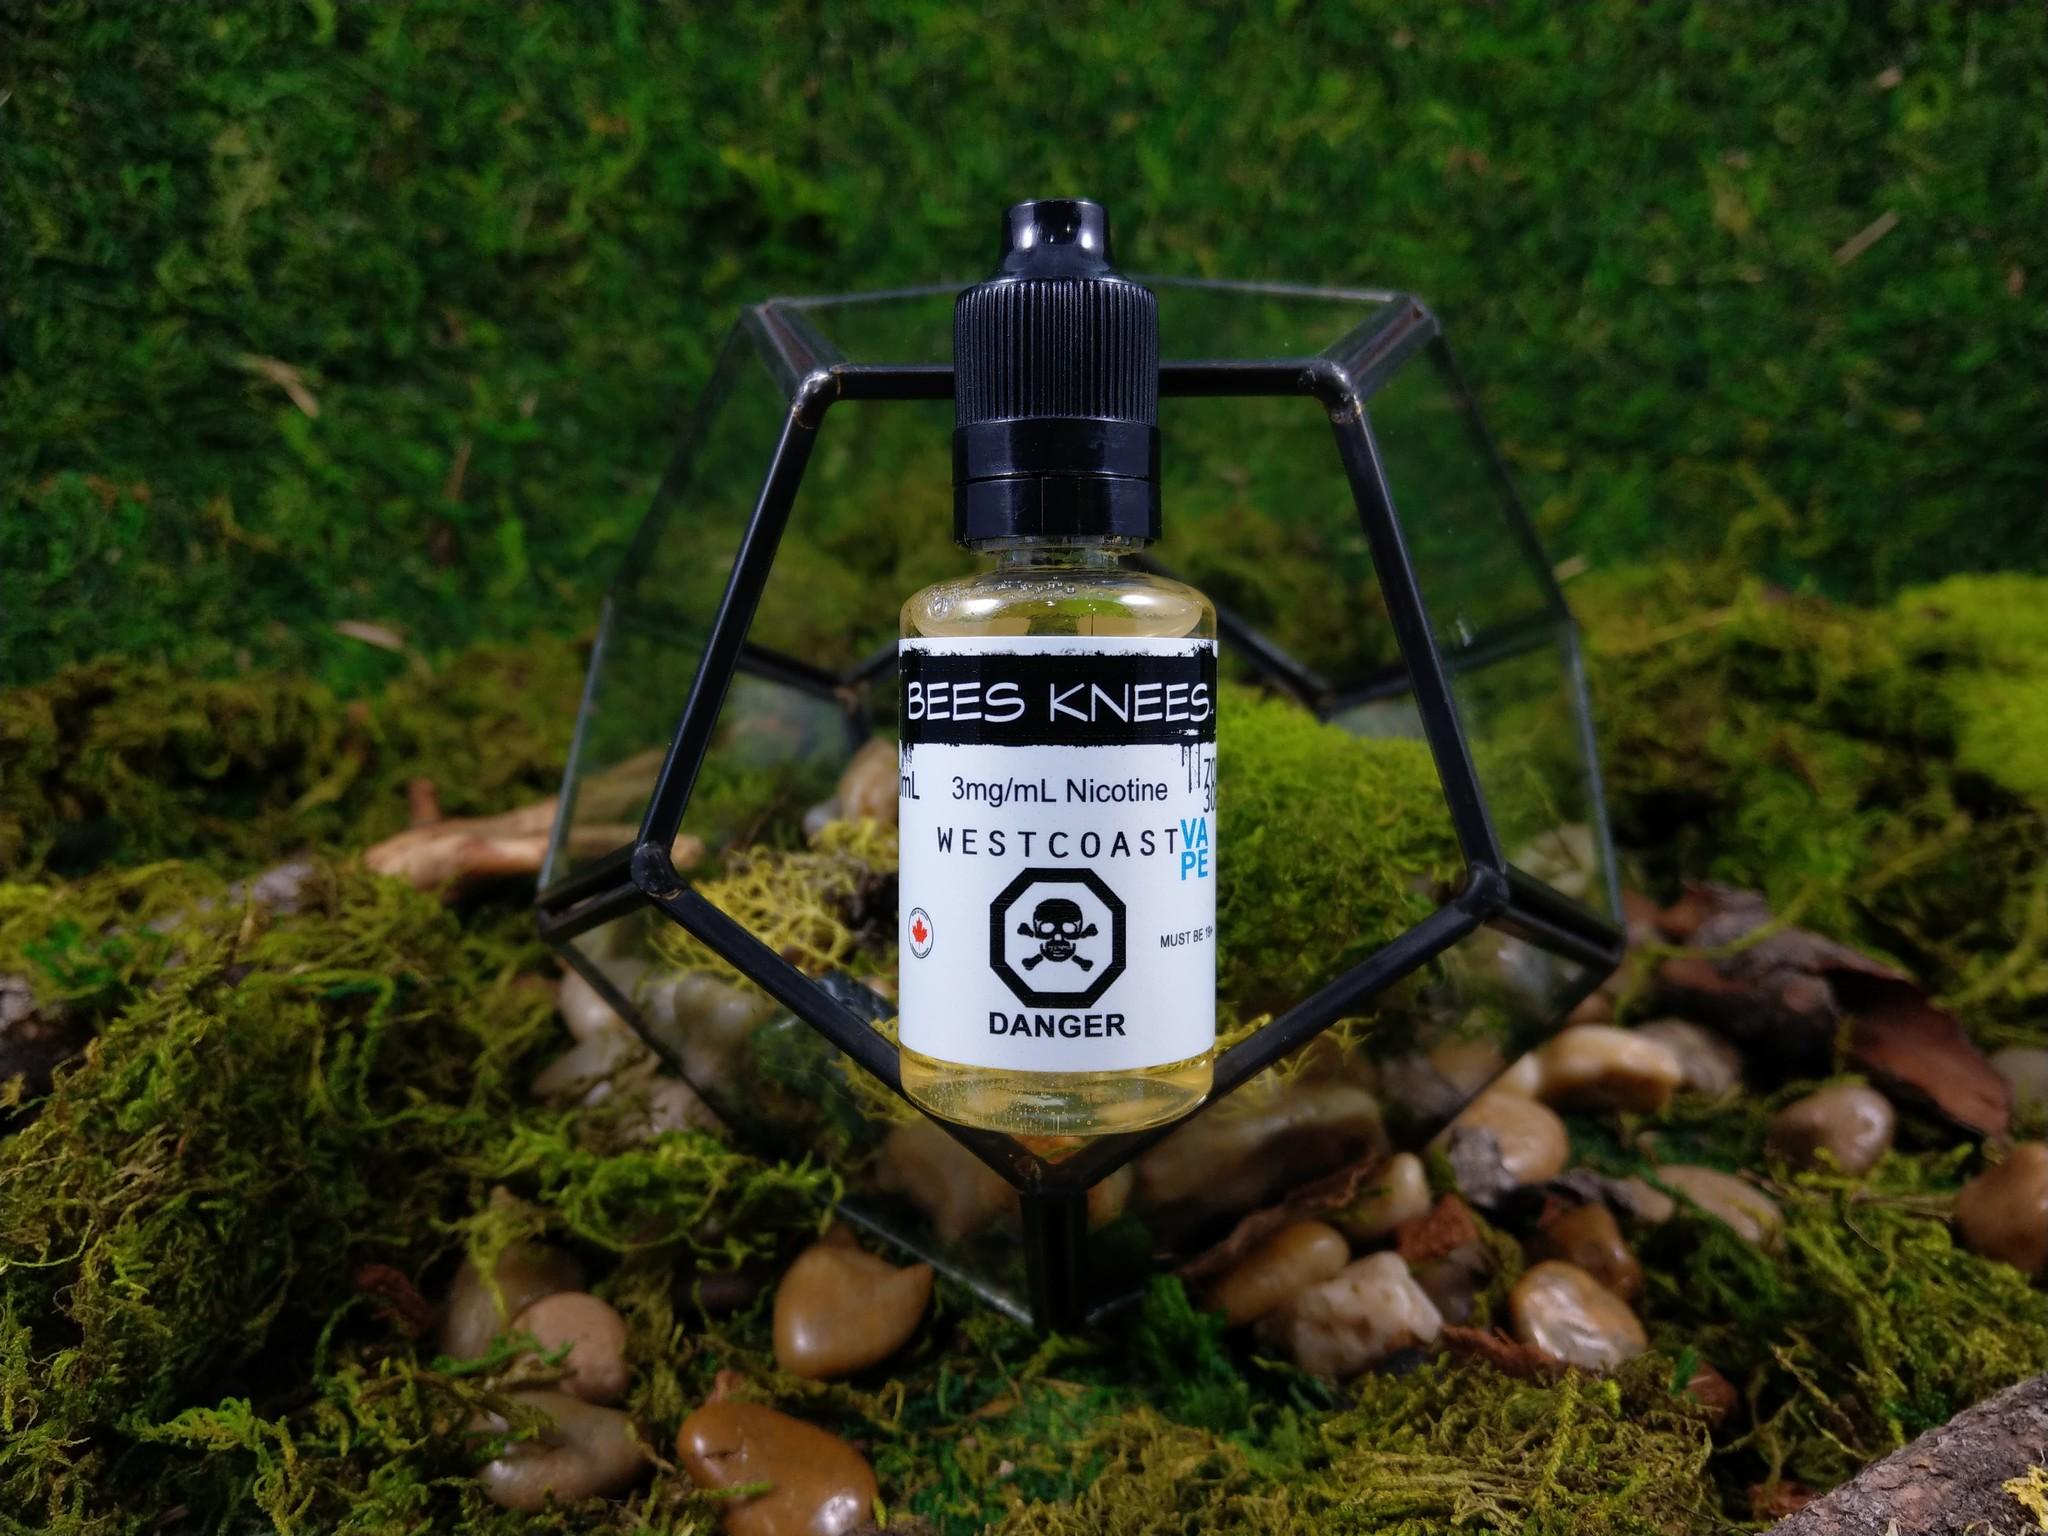 West Coast Vape E-Liquids Bees Knees